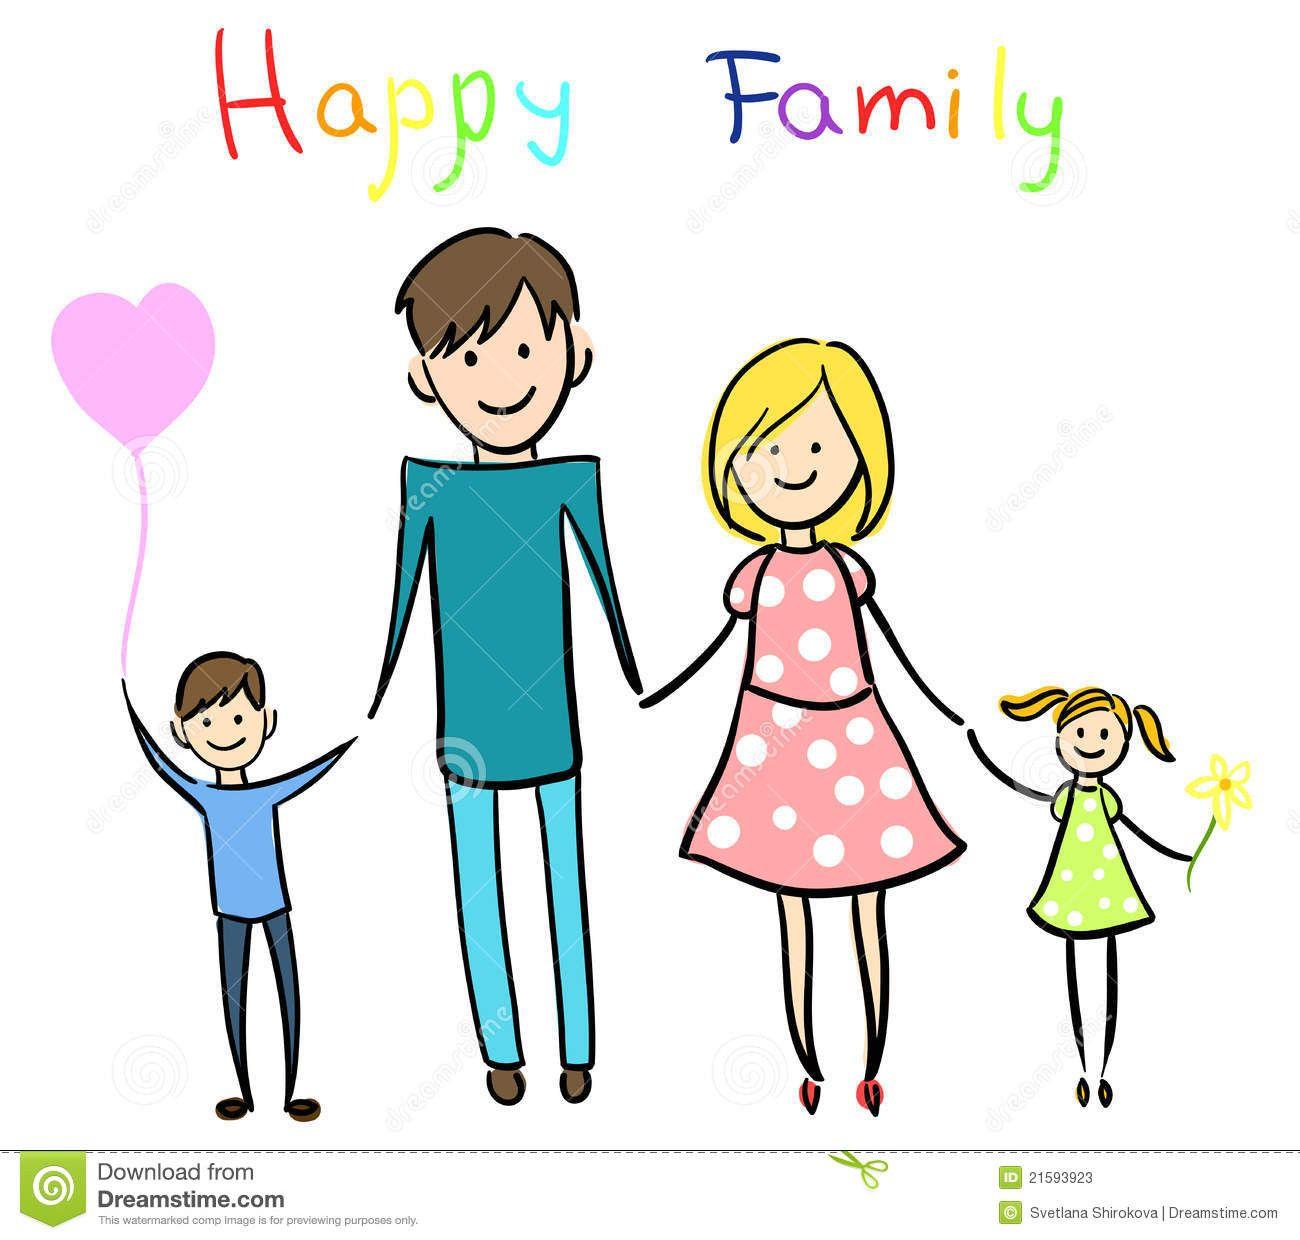 Family Clipart Happy Family 847 Stick Figure Family Family Illustration Family Clipart